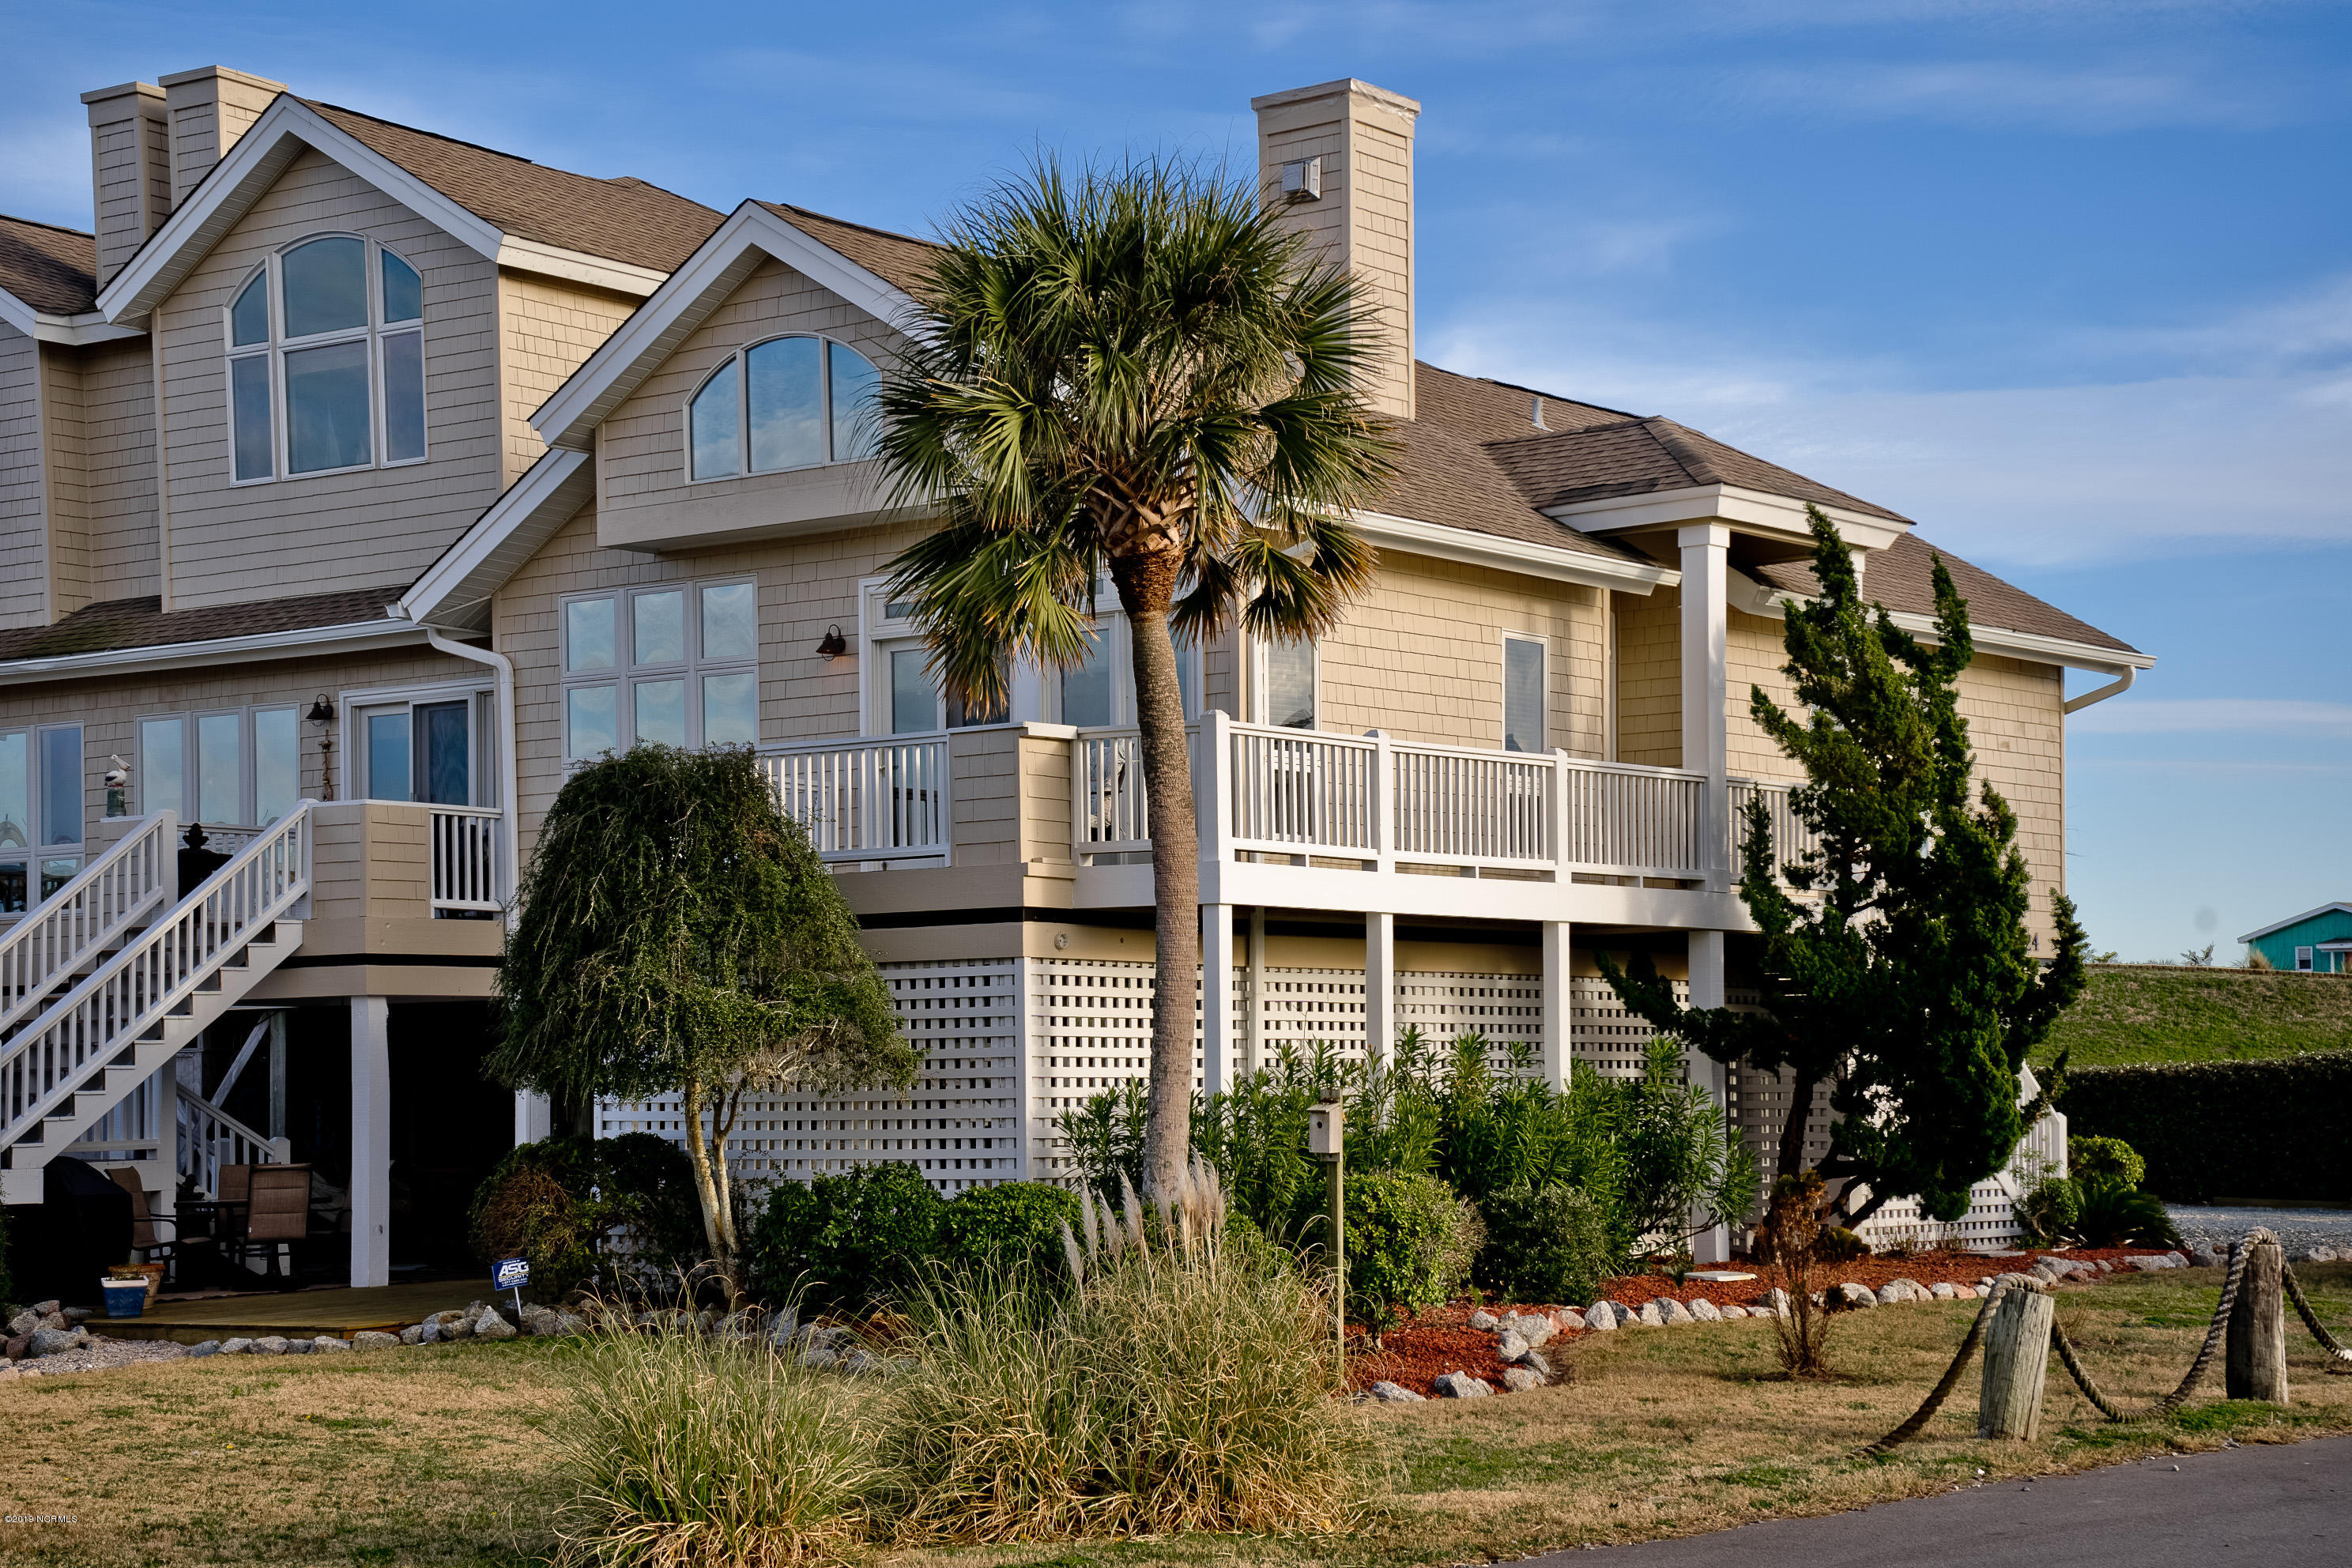 Carolina Plantations Real Estate - MLS Number: 100150995